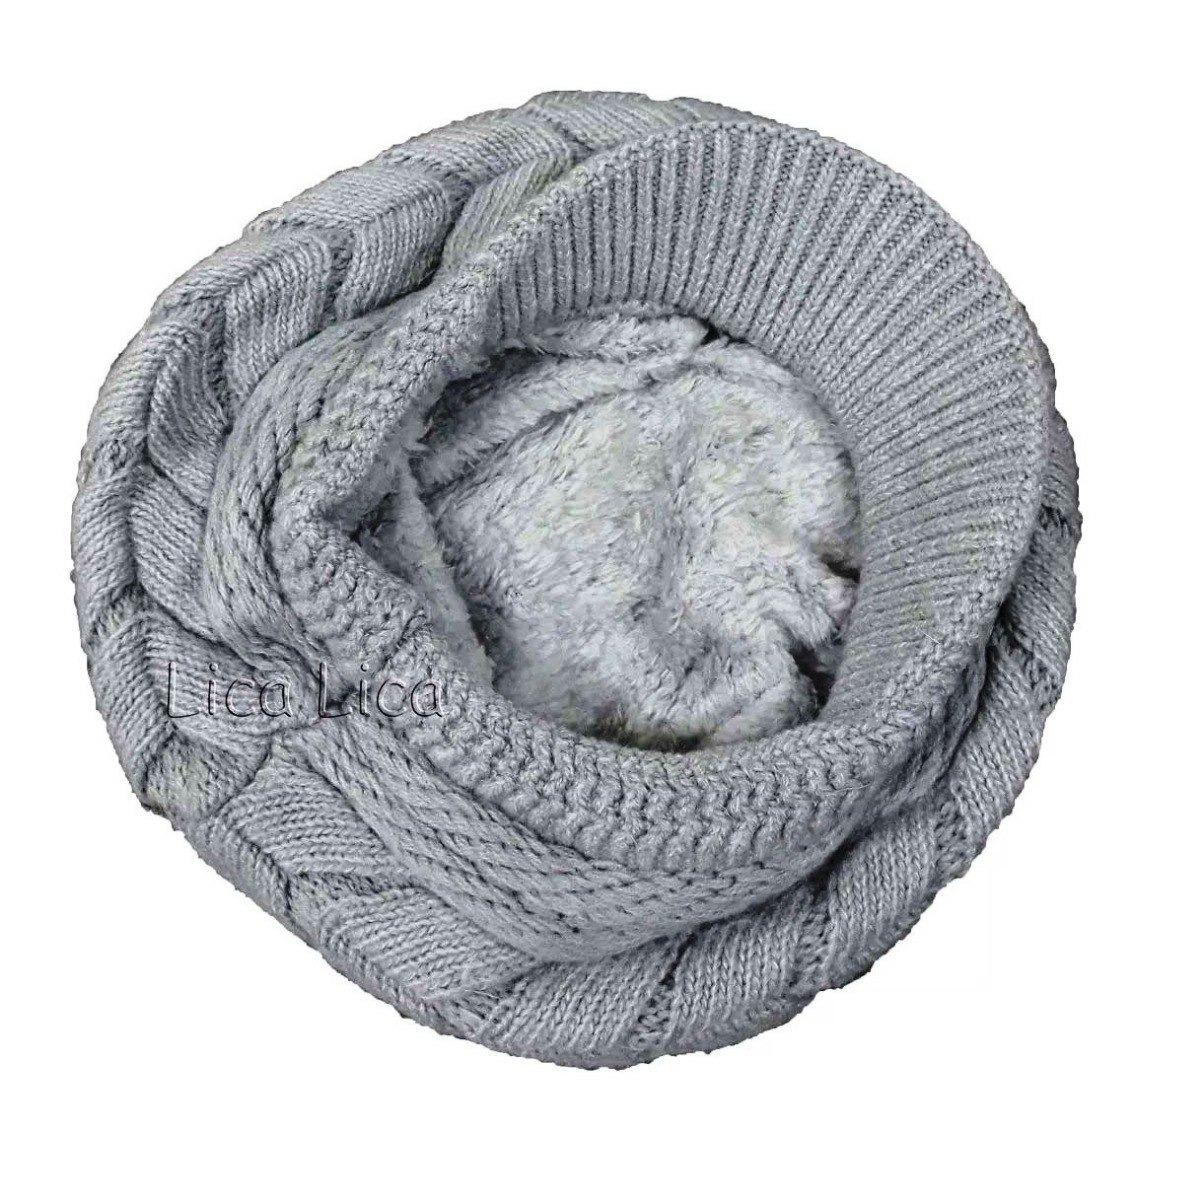 2b3927e61735f kit 10 boina feminina lã gorro touca trança aba tricô beanie. Carregando  zoom.